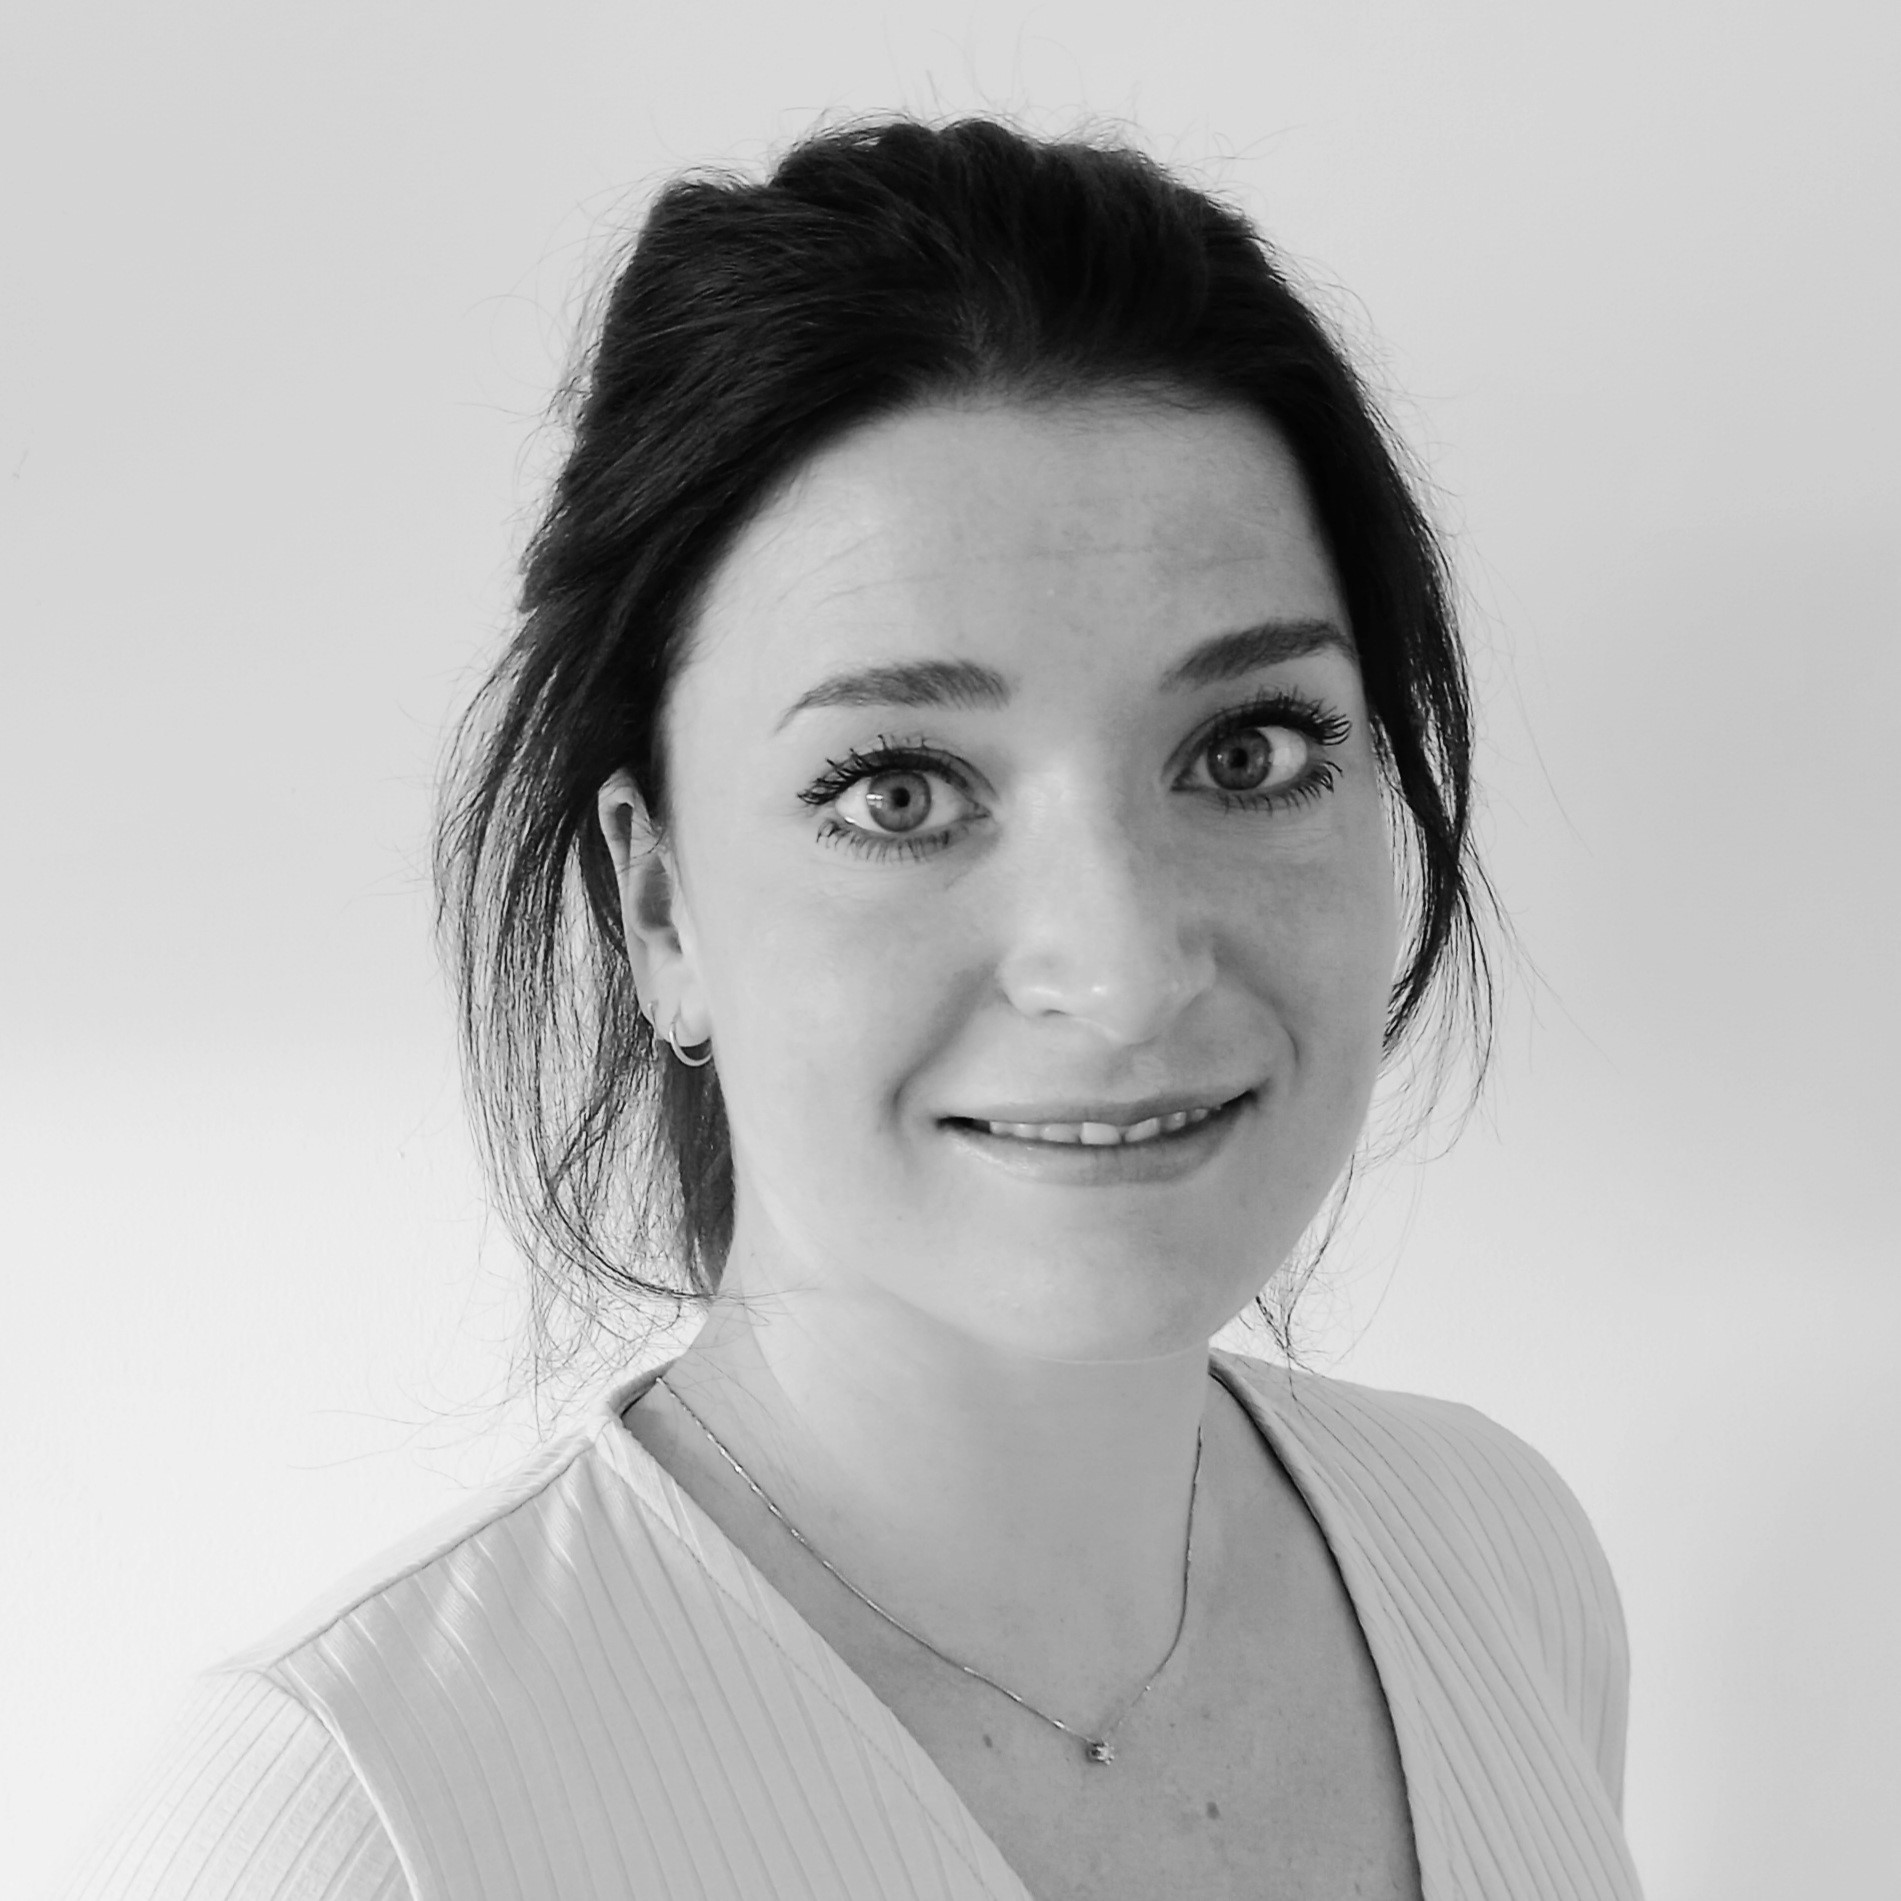 Susanne Grob